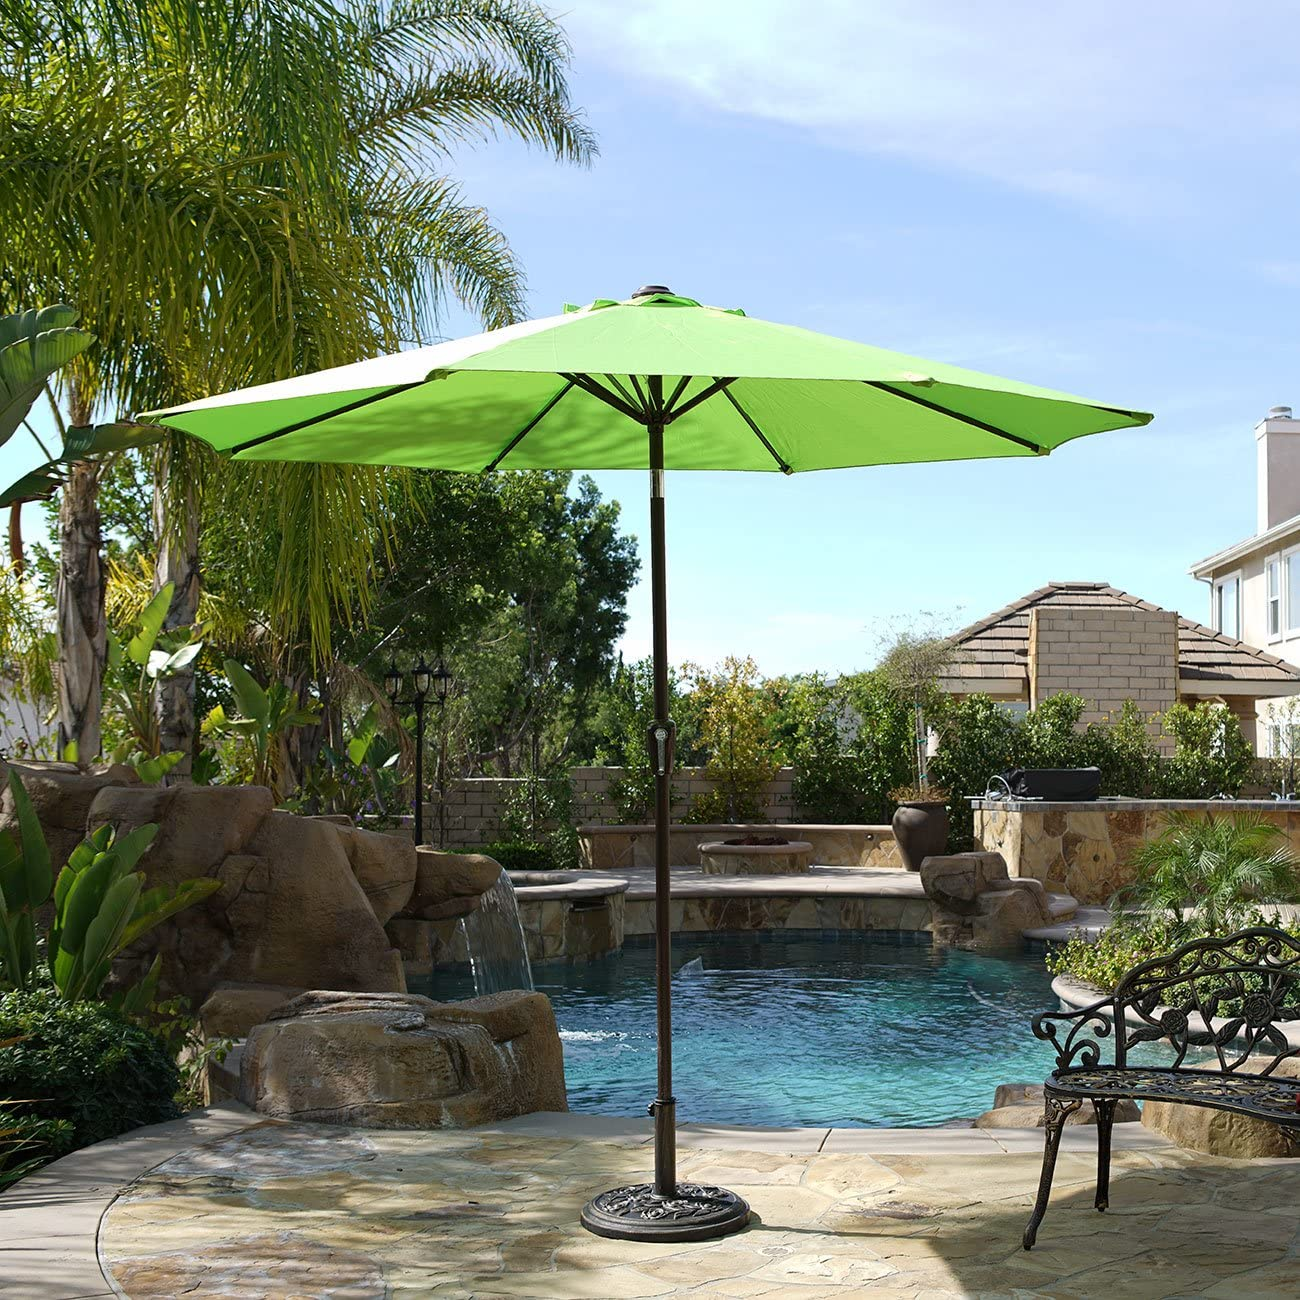 BELLEZE 9 Patio Umbrella Outdoor Table Umbrella Lawn Yard UV Backyard Garden with Heavy Duty Sturdy Ribs -Lime Green